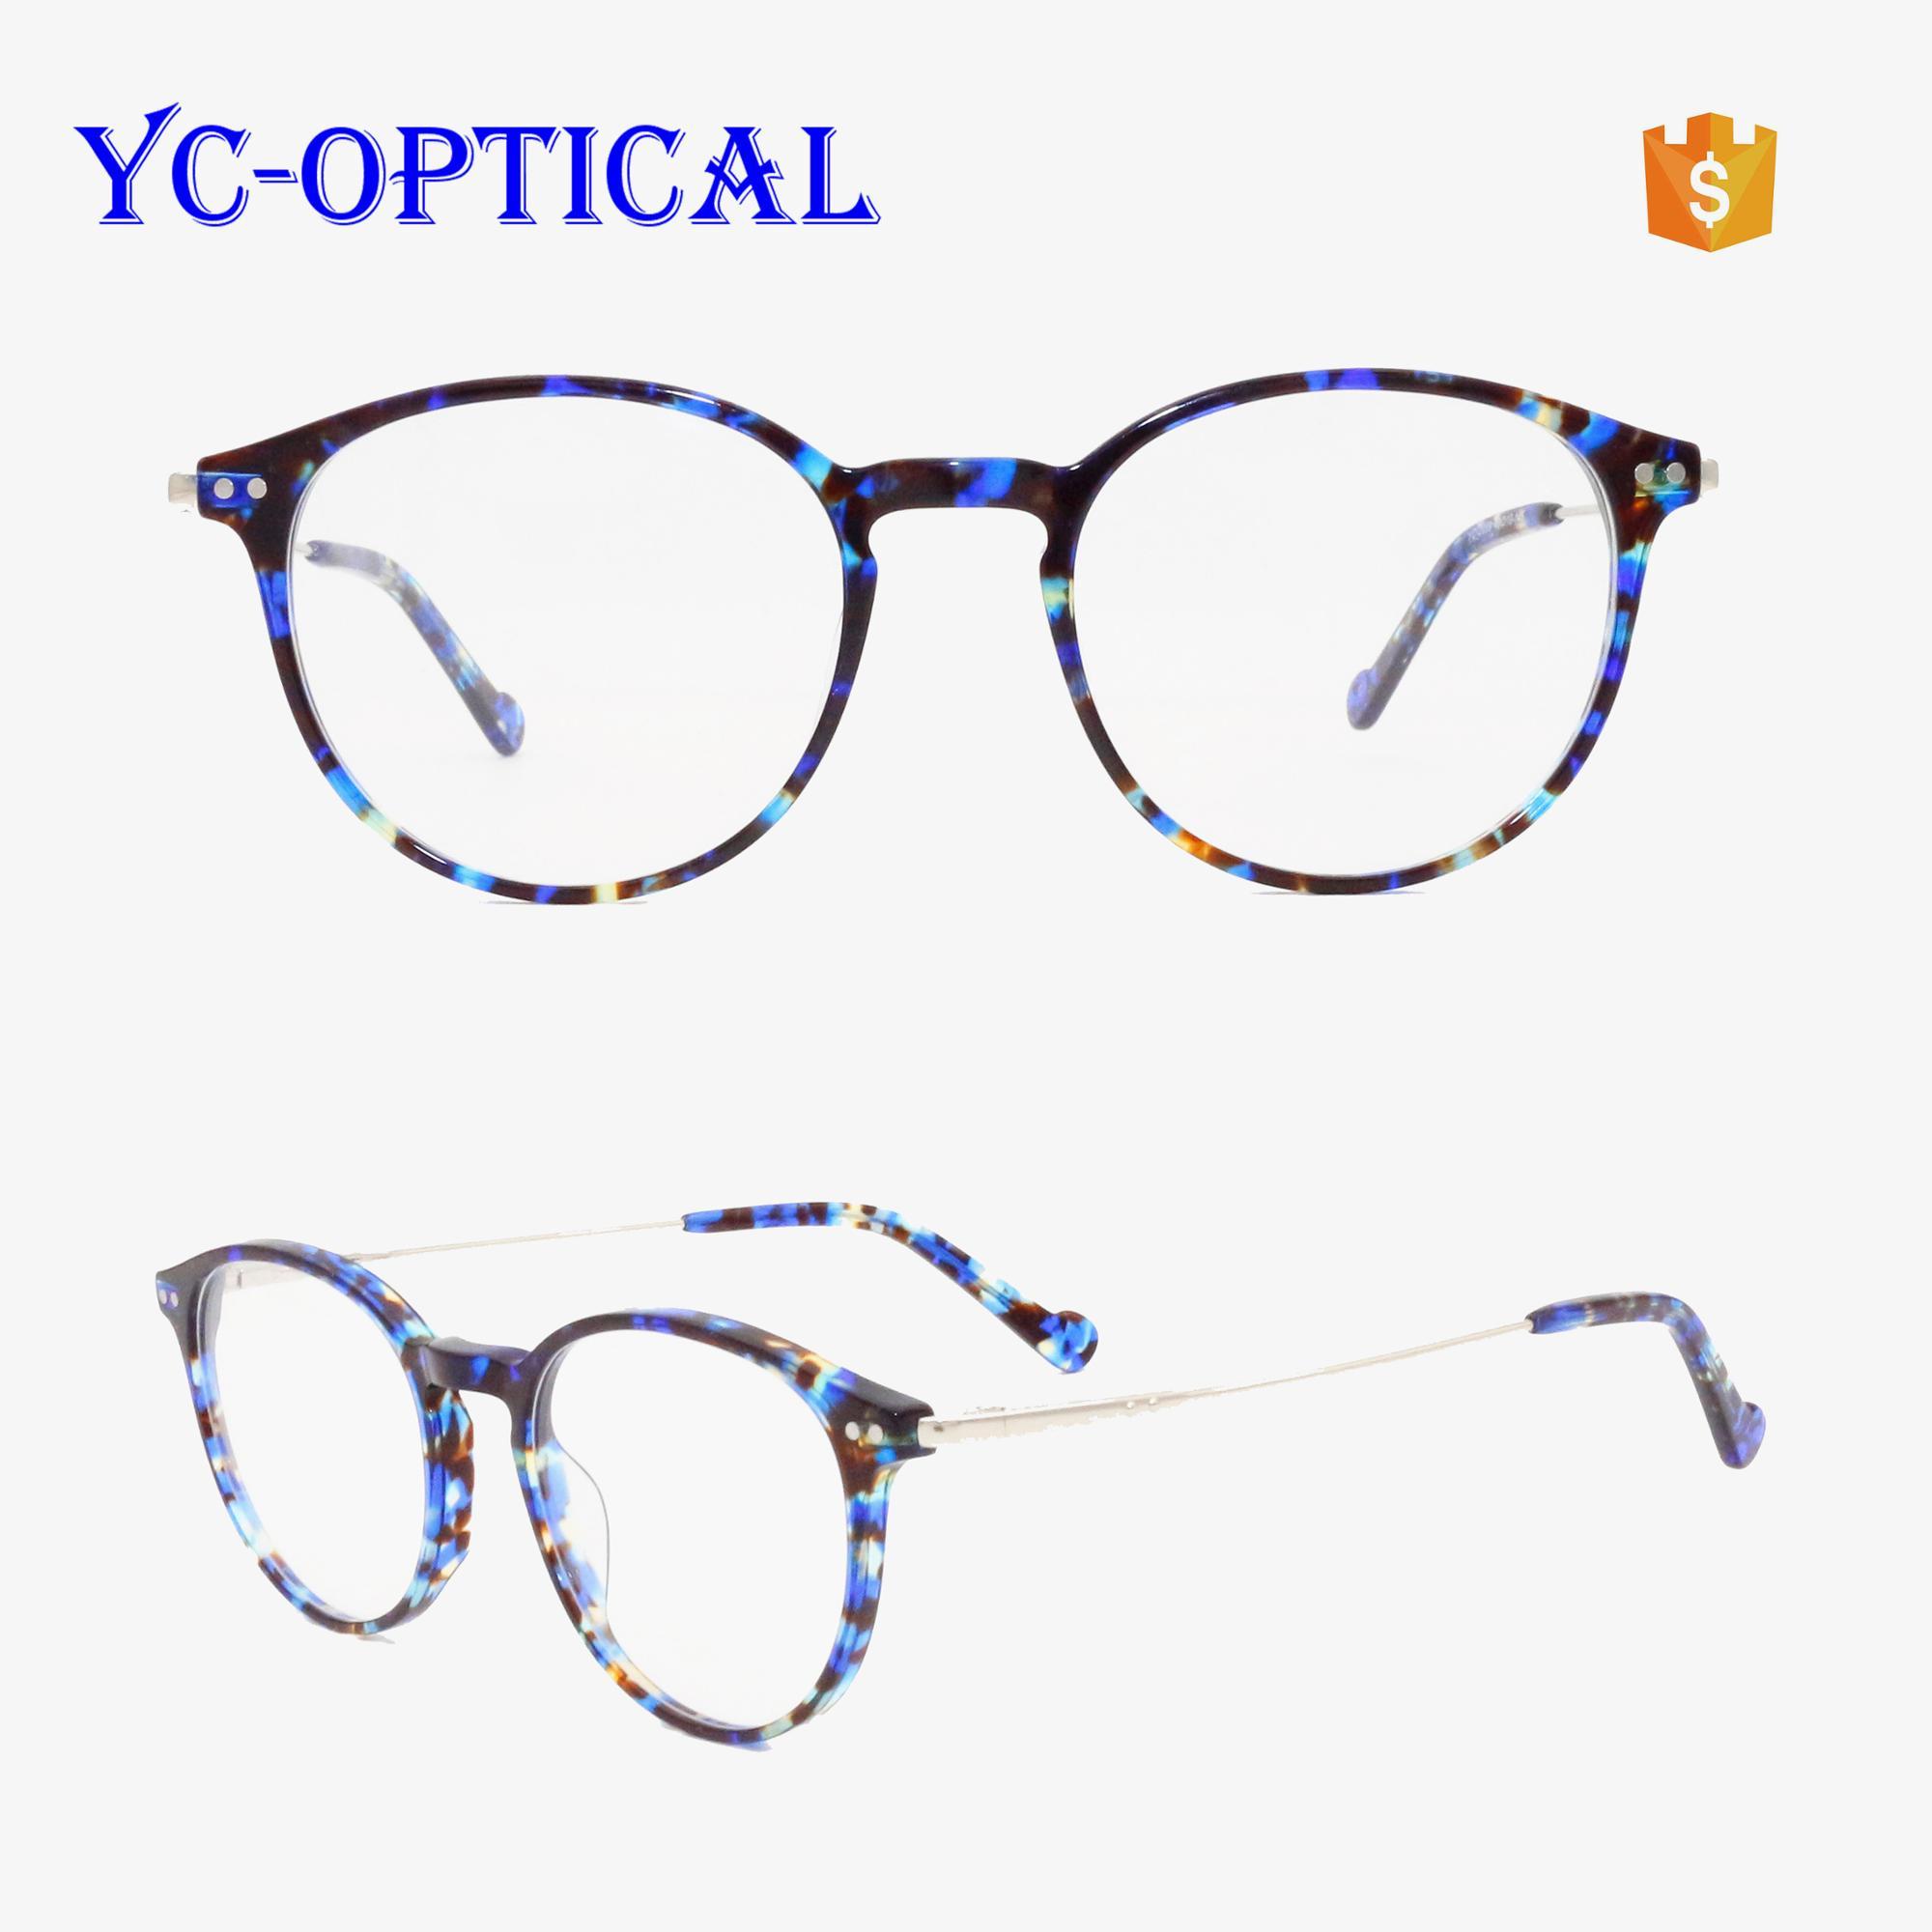 2088ac1b0d1 latest glasses frames for girl wholesale optical frames women glasses  acetate round frames metal temple combo